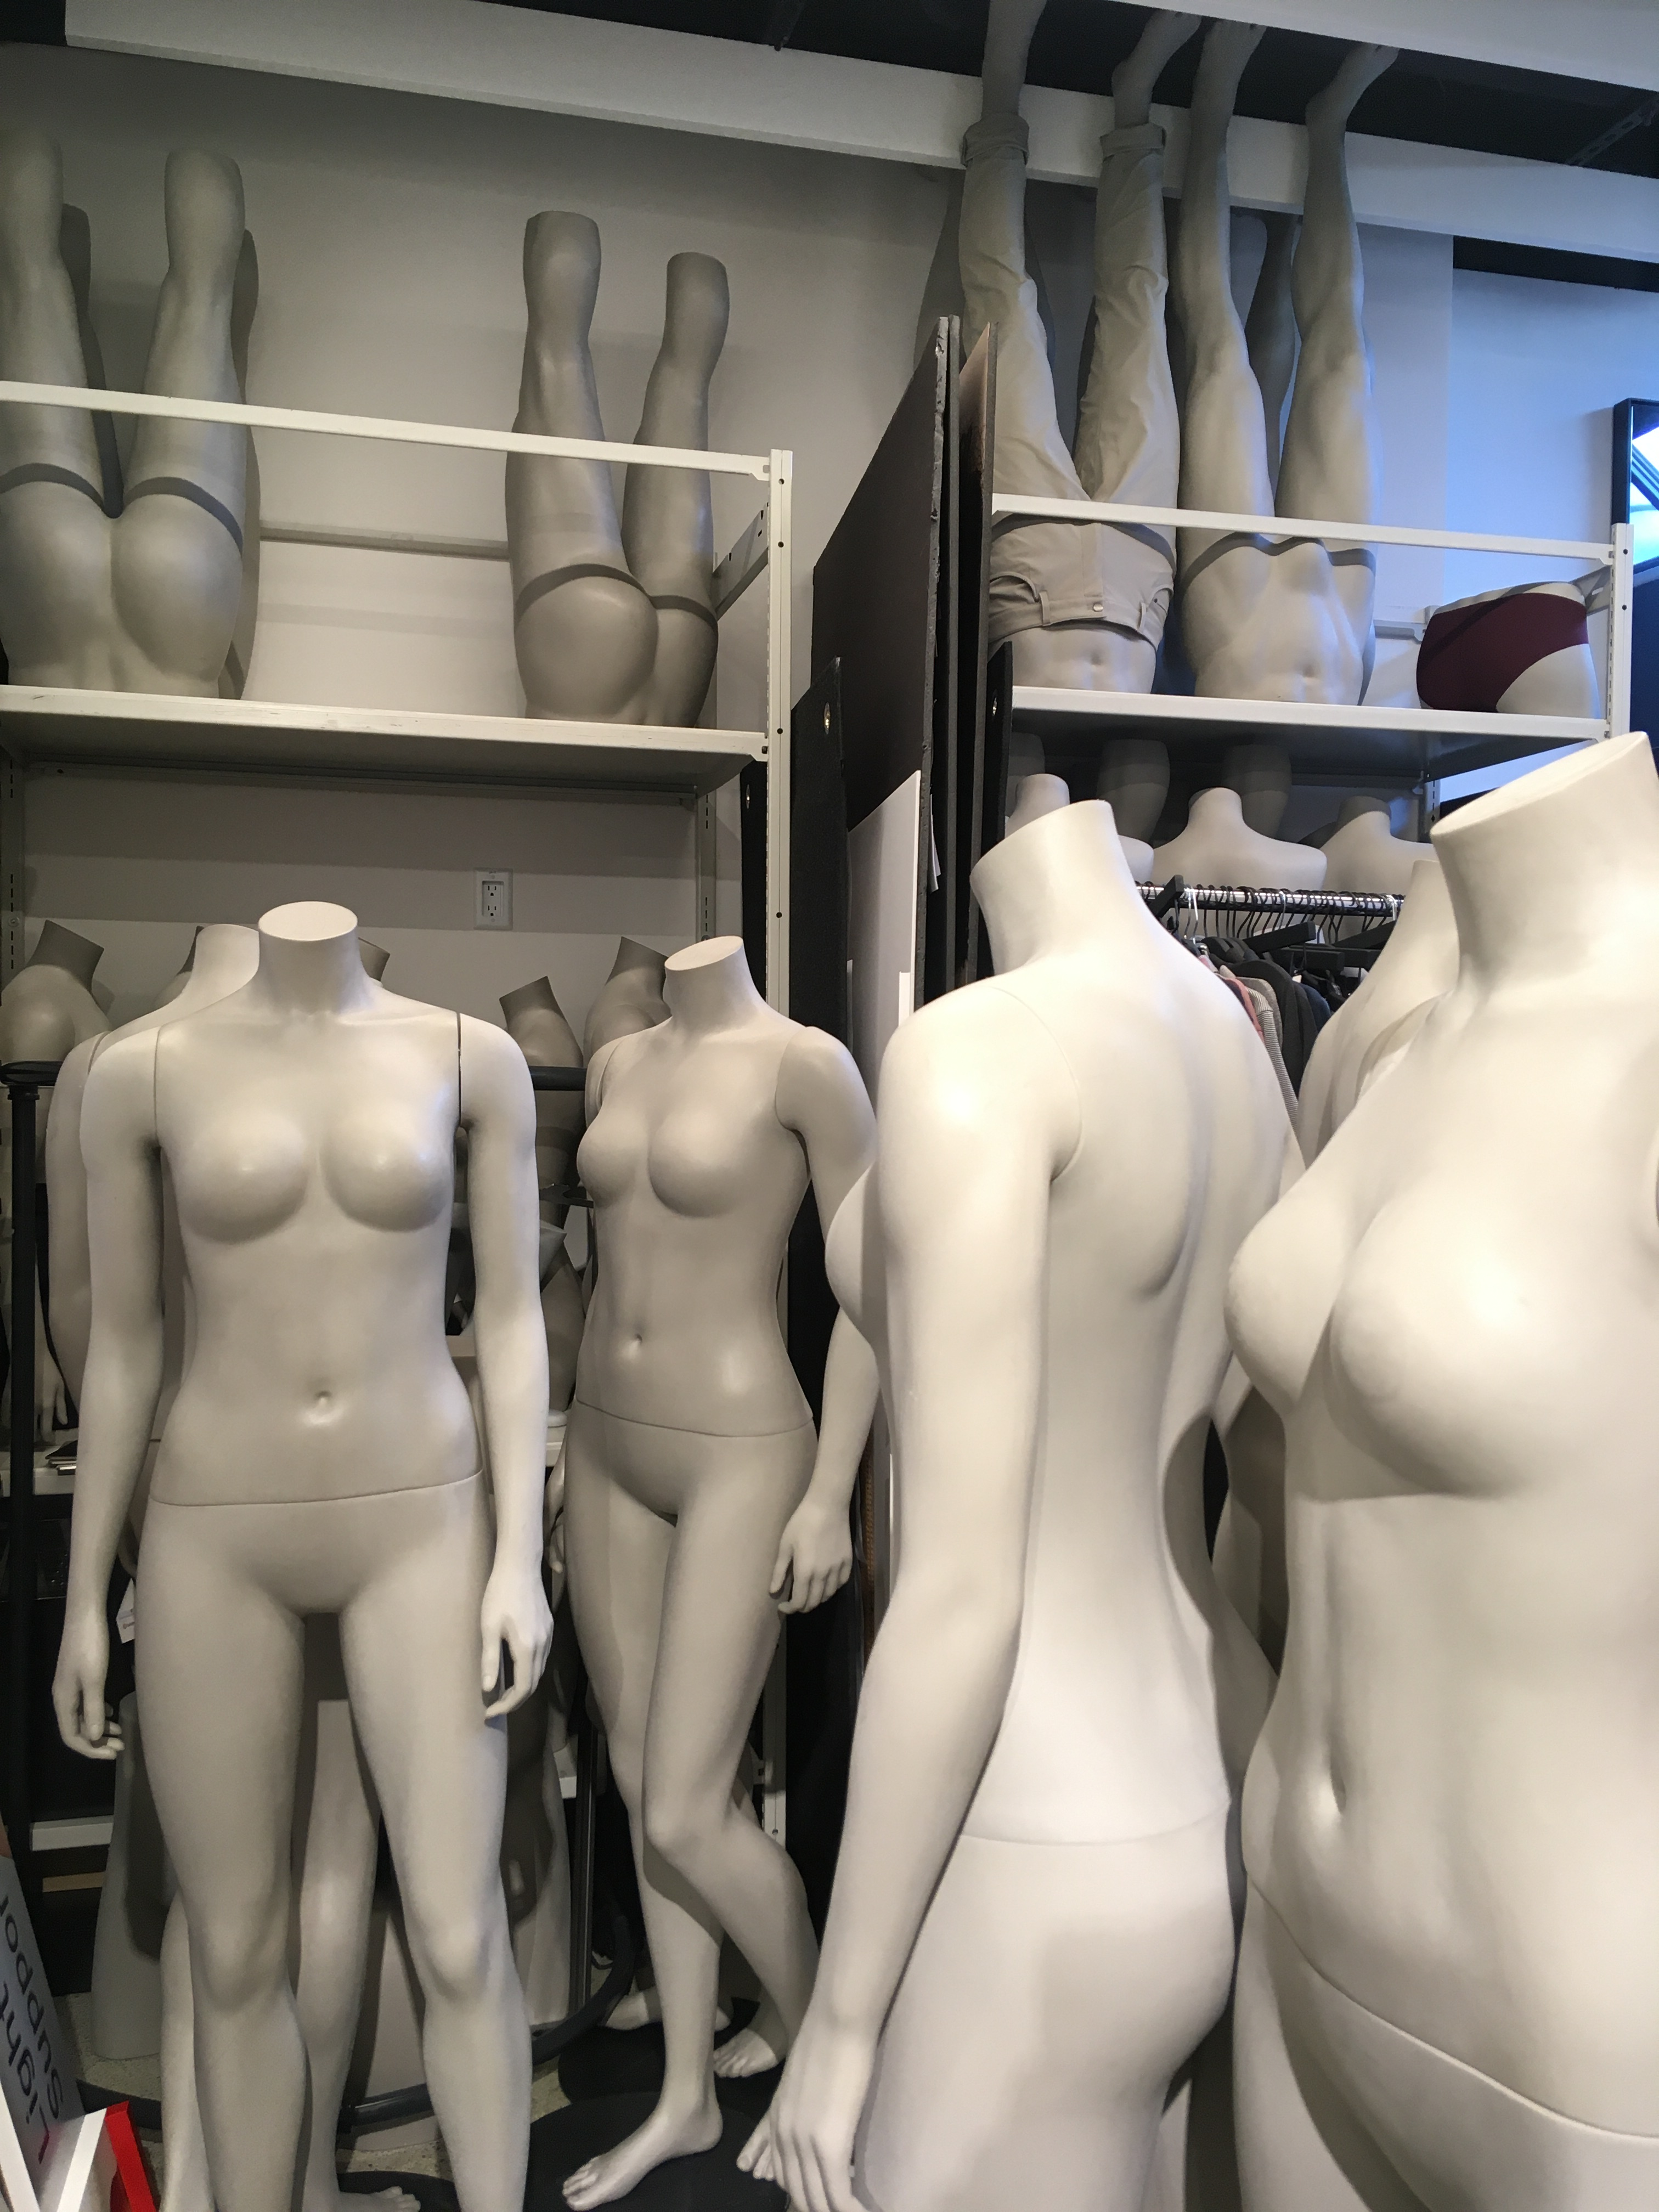 View of women's mannequins in storage.